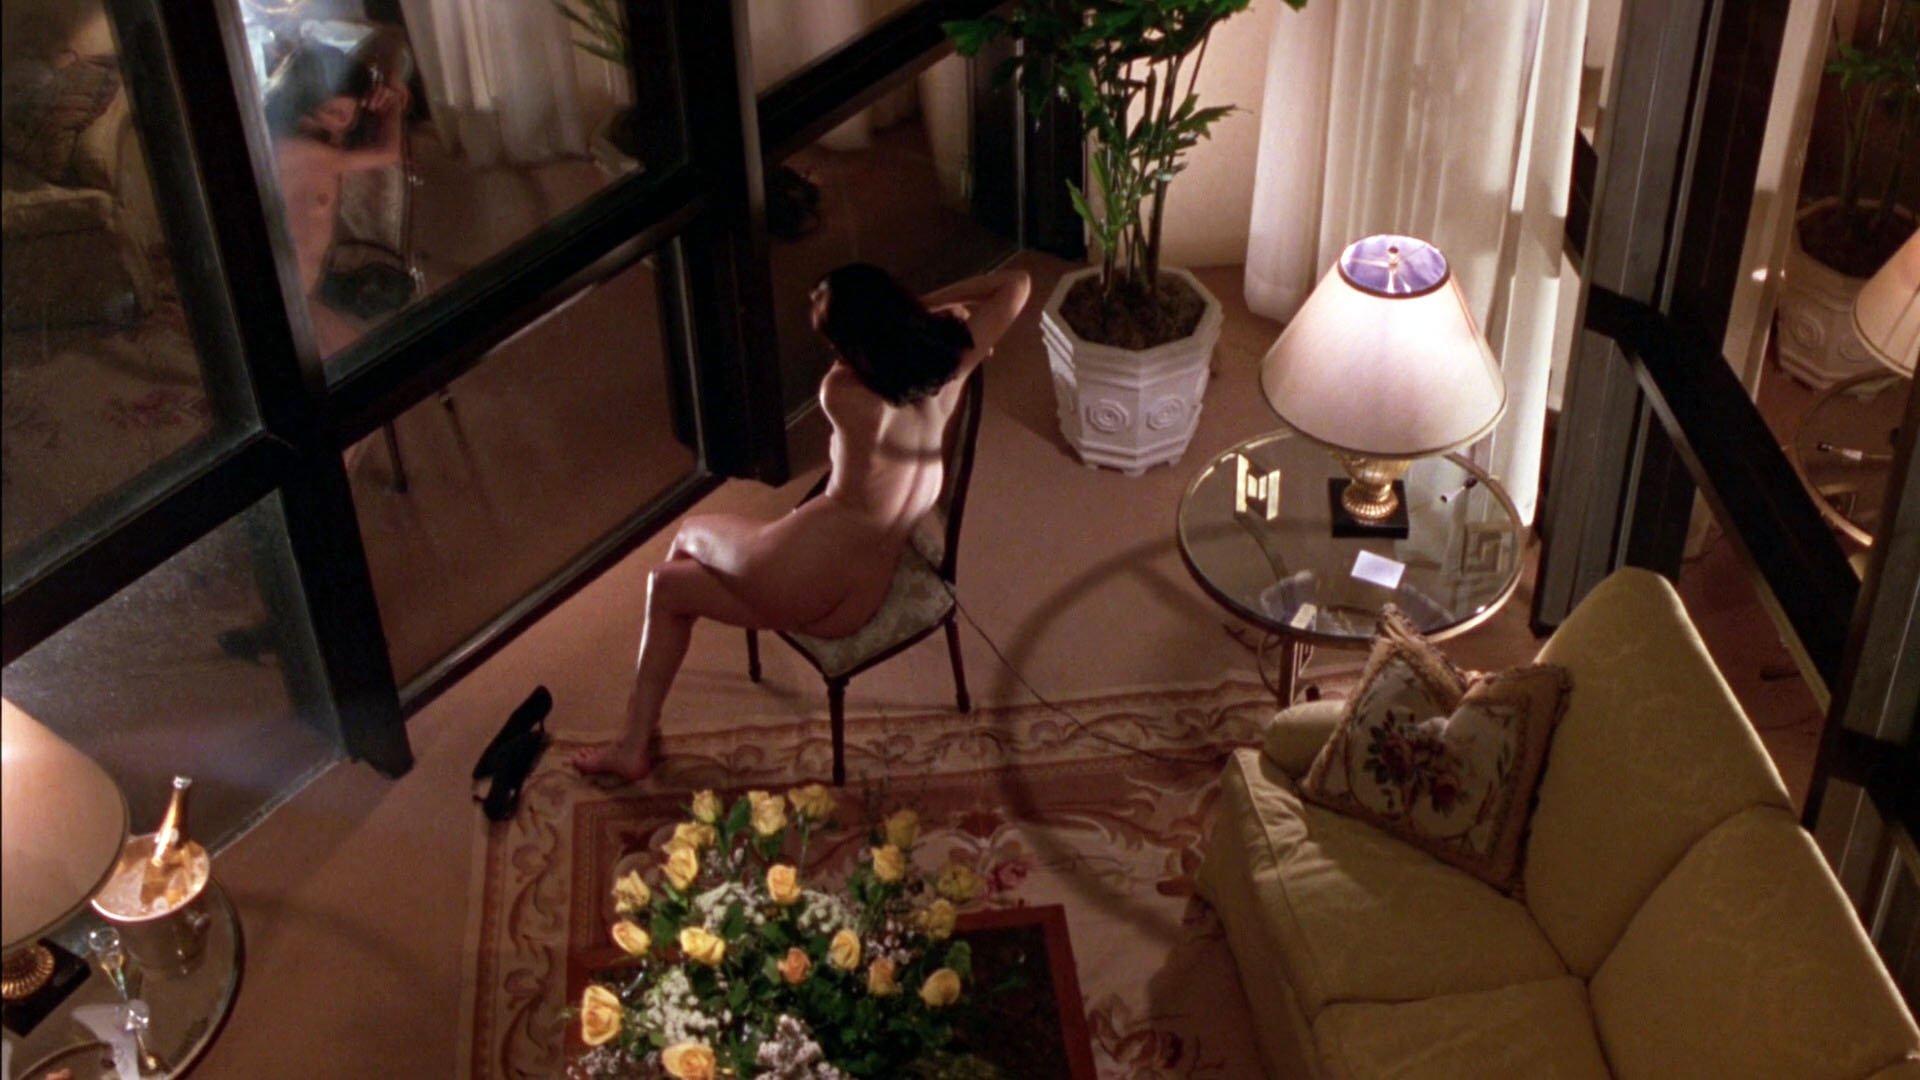 Beyond the law linda fiorentino nude